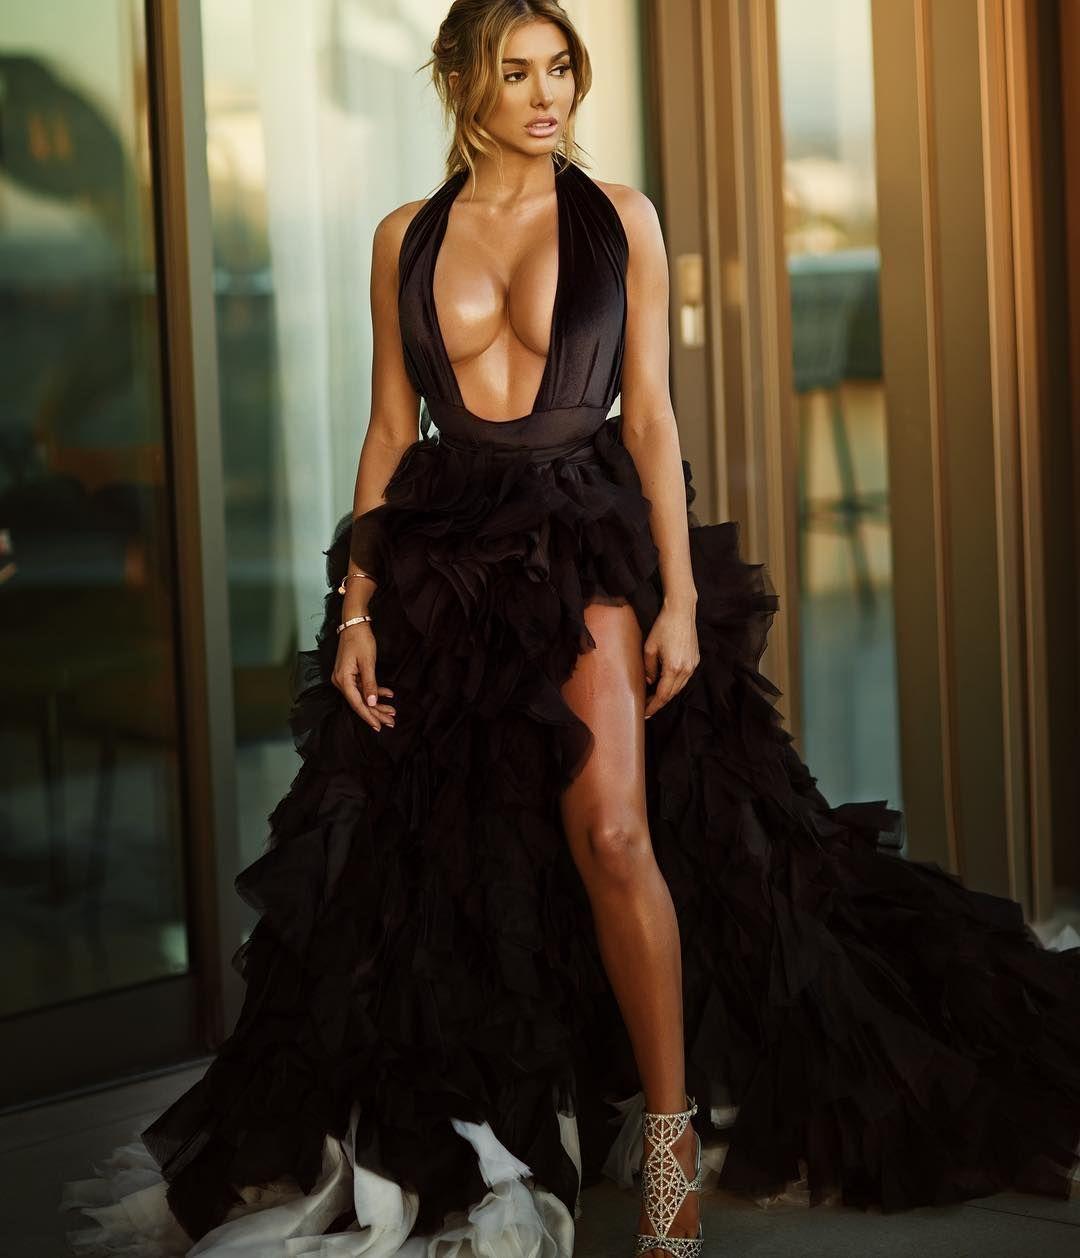 Paparazzi Lyna Perez naked (77 photos), Tits, Sideboobs, Twitter, underwear 2019